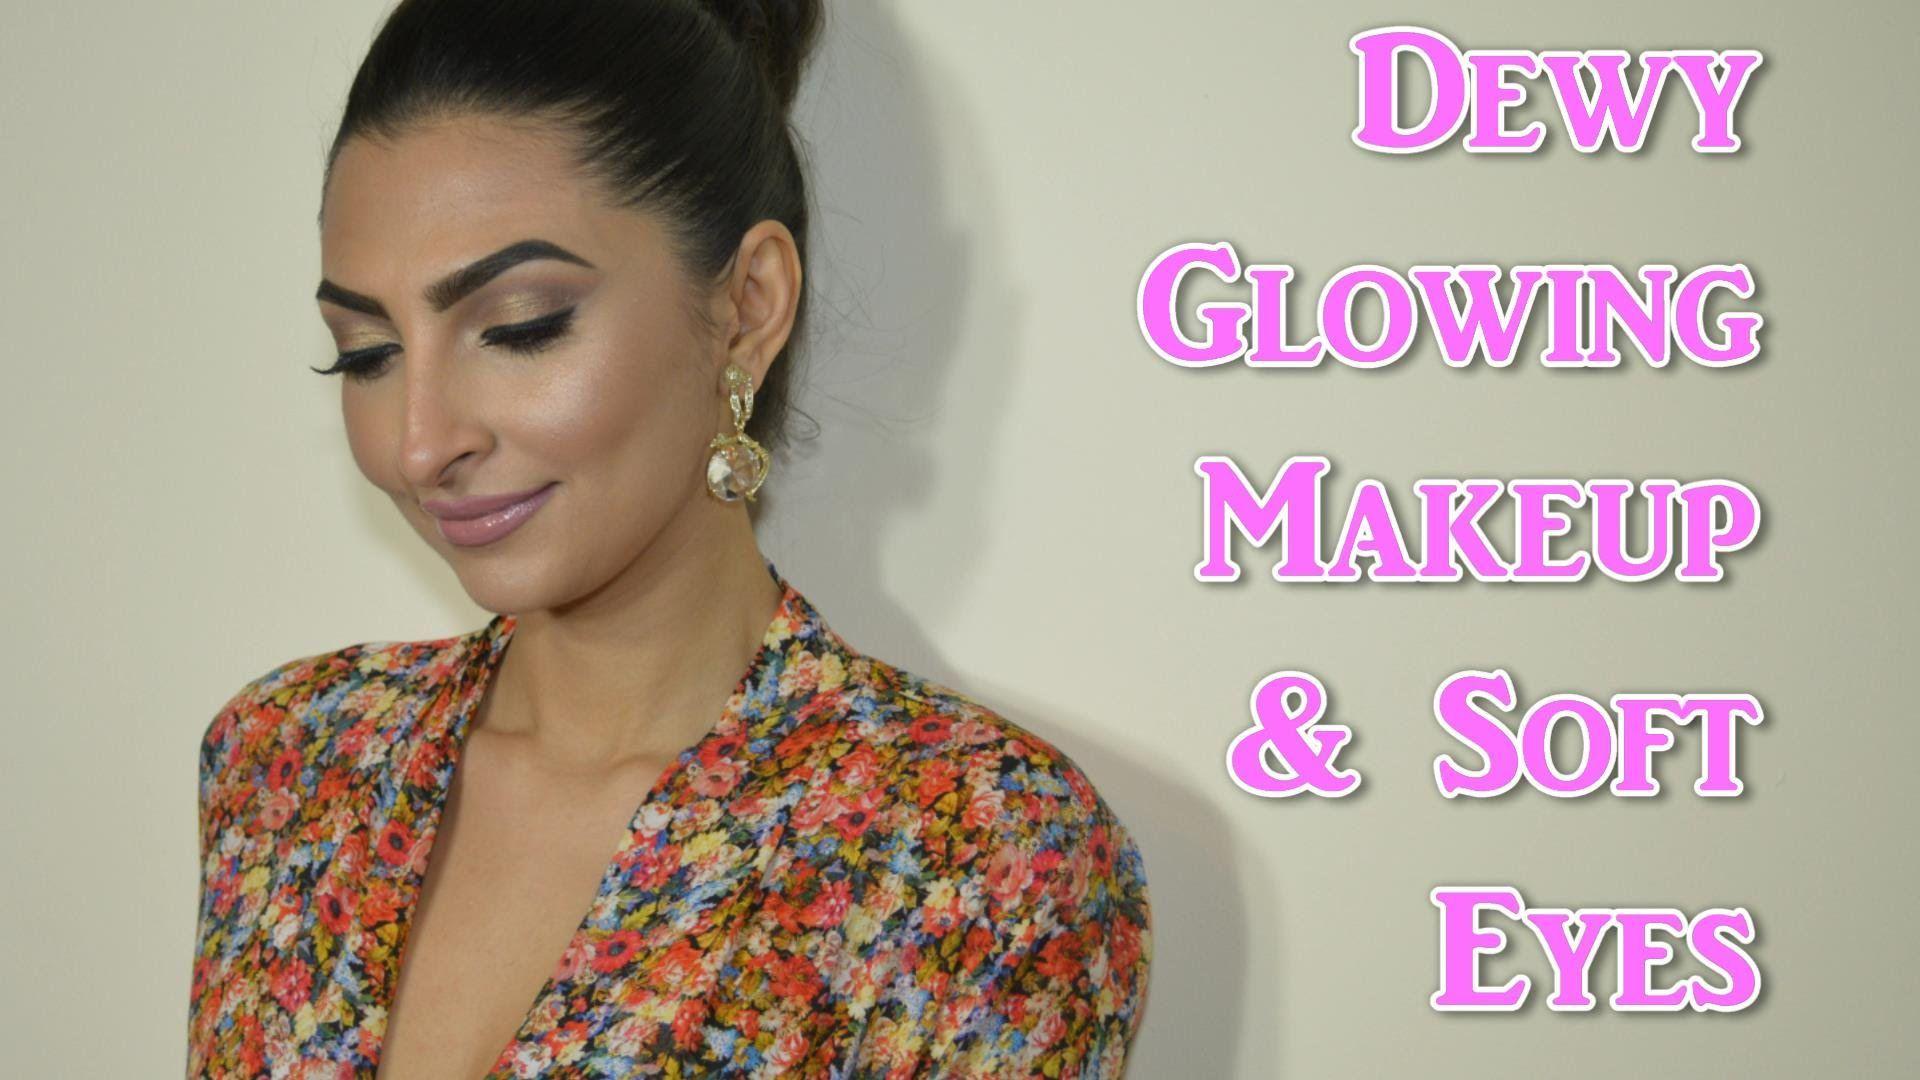 Dewy Glowing Makeup & Soft Eyes Glowing makeup, Soft